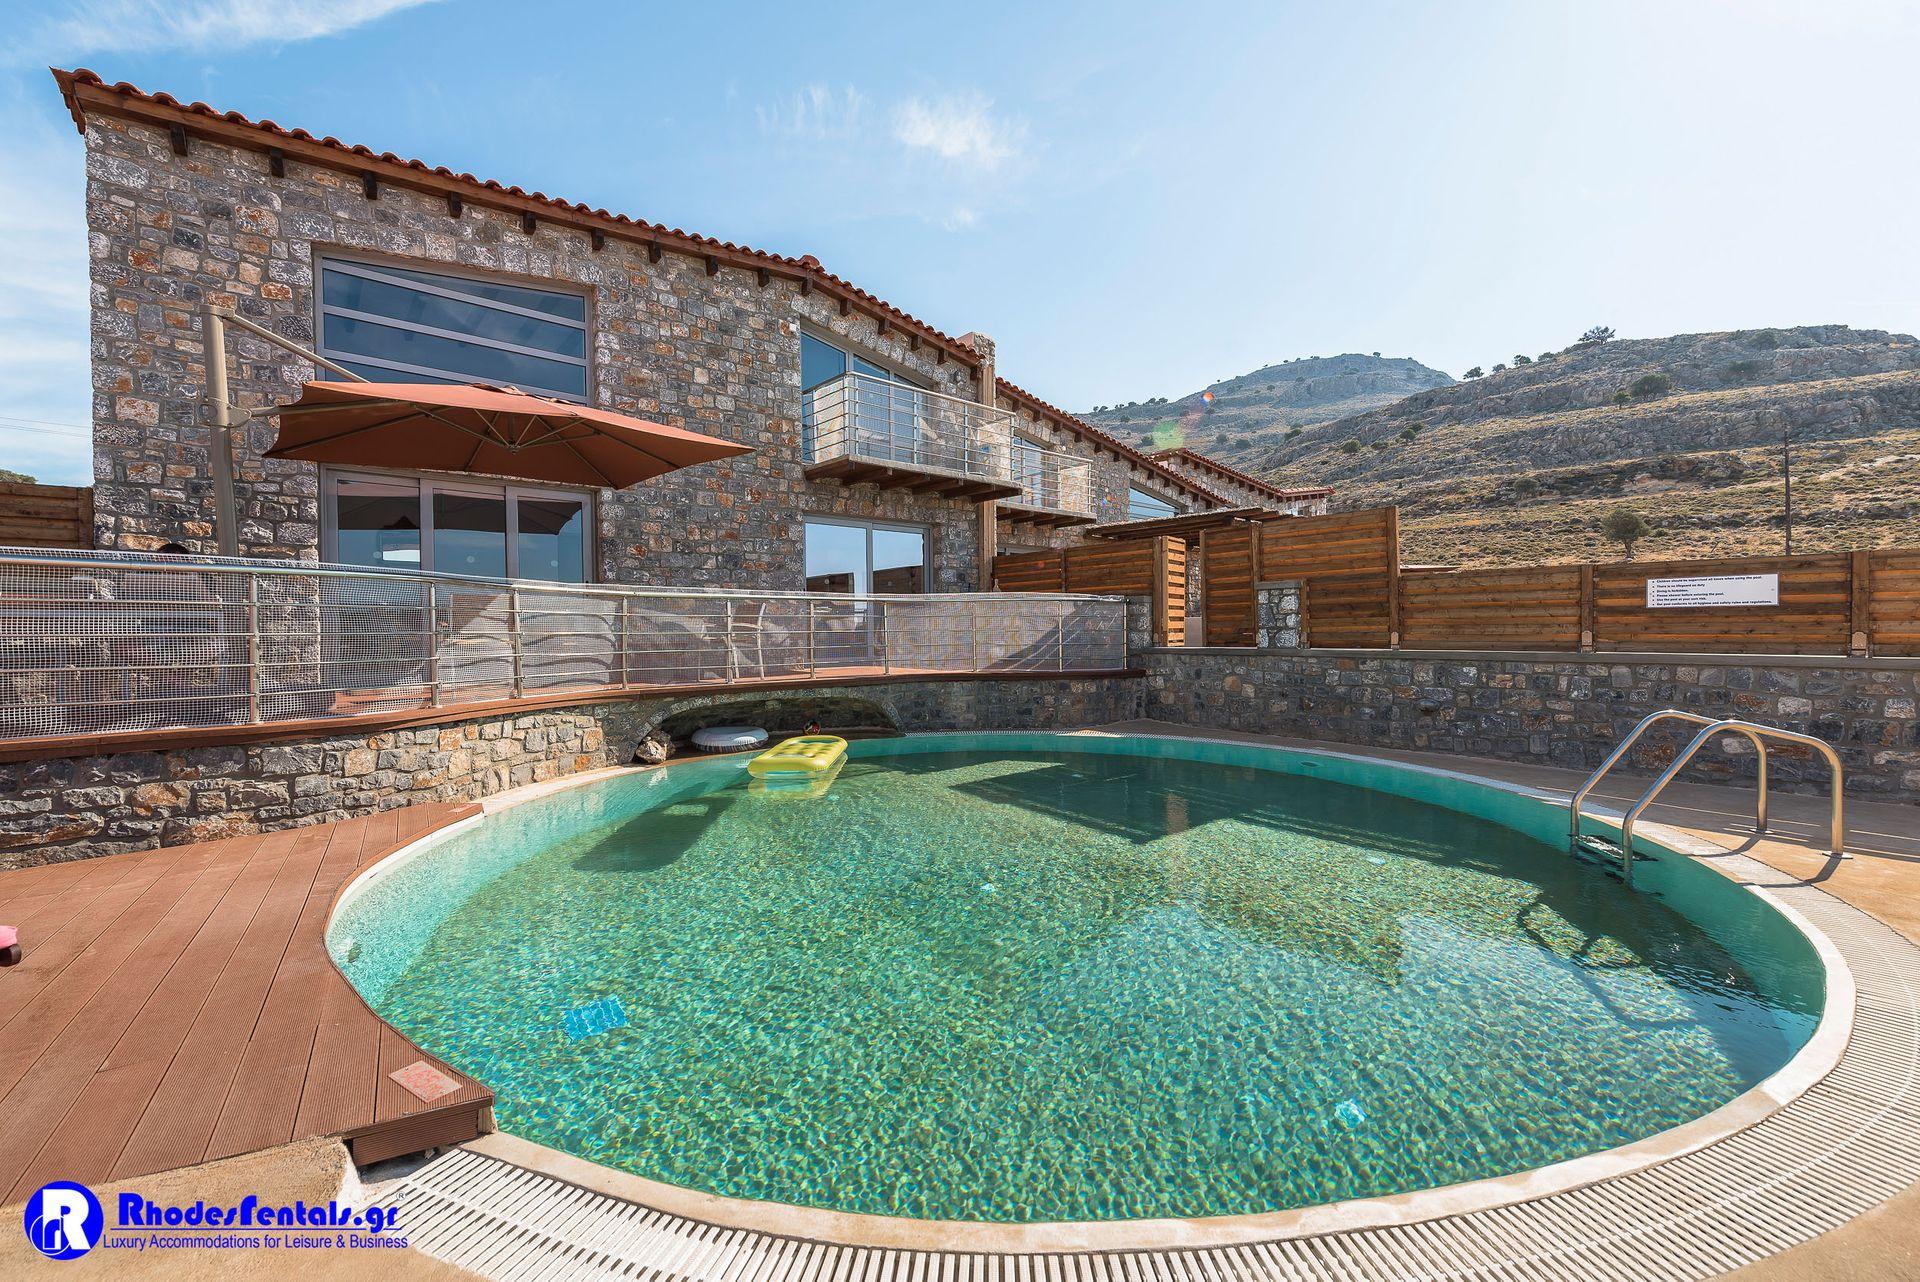 Lindos Seastone Villas Rhodes - Πεύκοι, Ρόδος ✦ 2 Ημέρες (1 Διανυκτέρευση) ✦ 2 άτομα ✦ Χωρίς Πρωινό ✦ 01/09/2020 έως 30/09/2020 ✦ Free WiFi